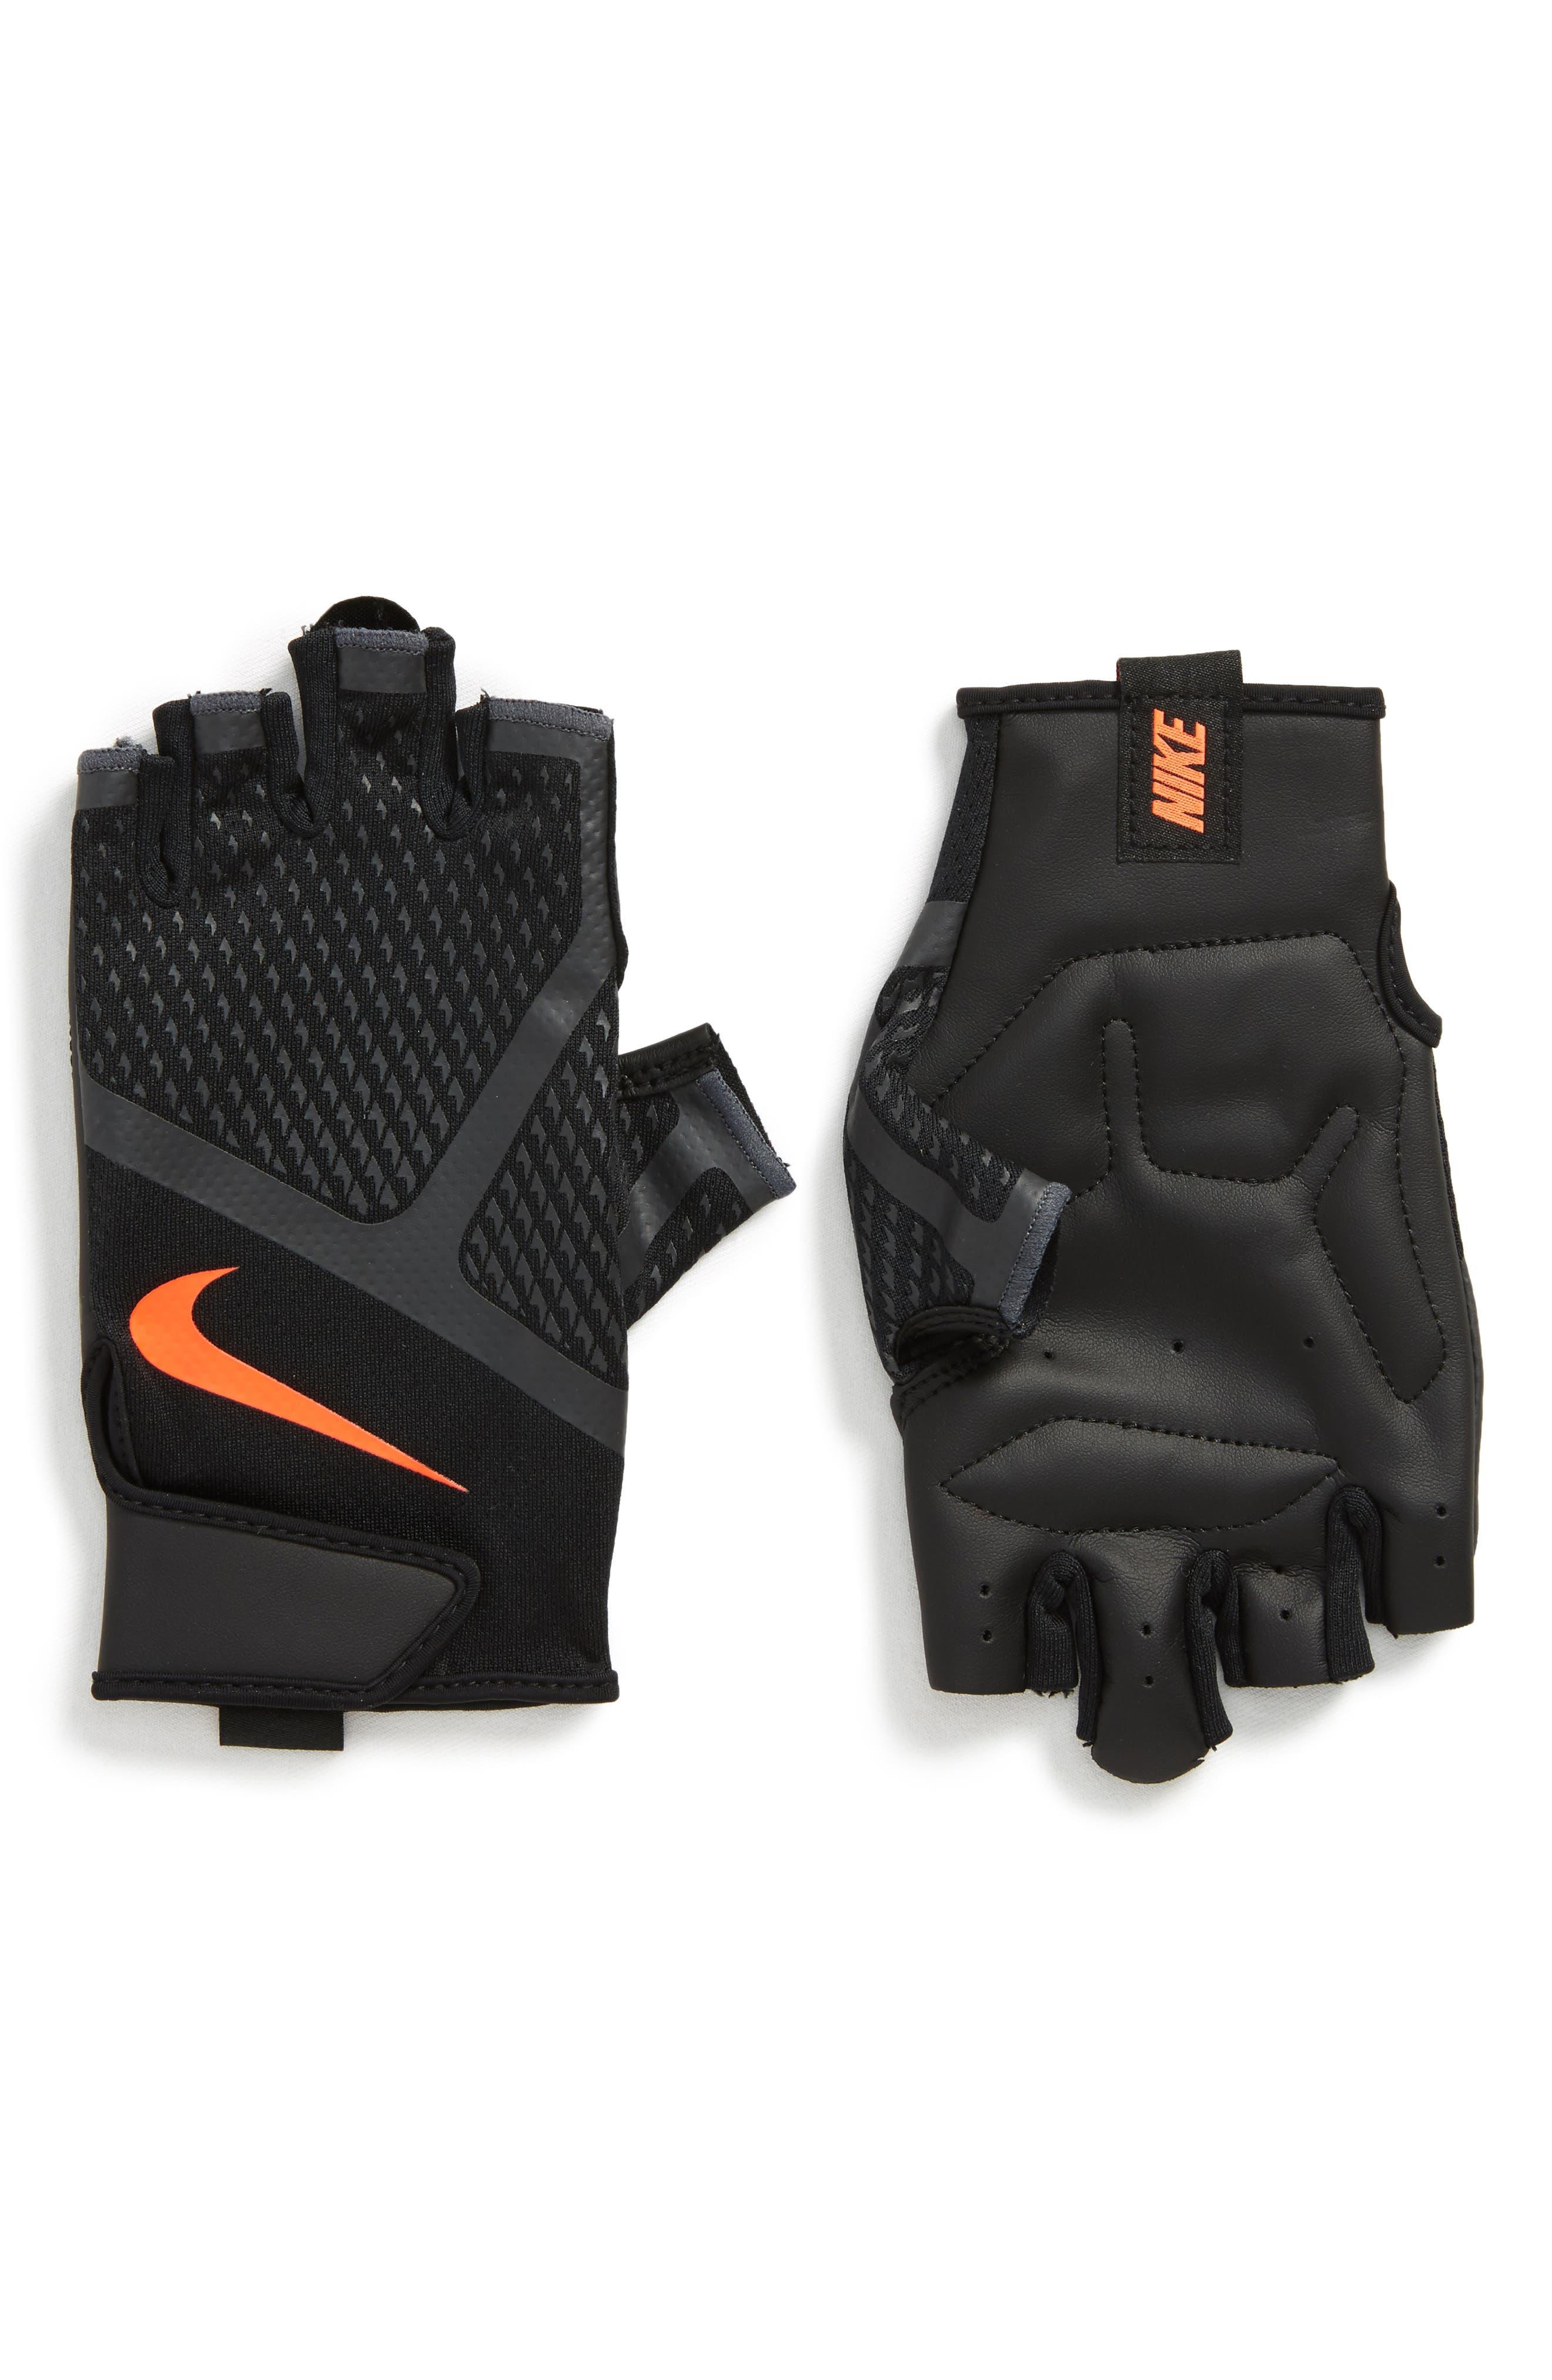 Renegade Training Gloves,                             Main thumbnail 1, color,                             015